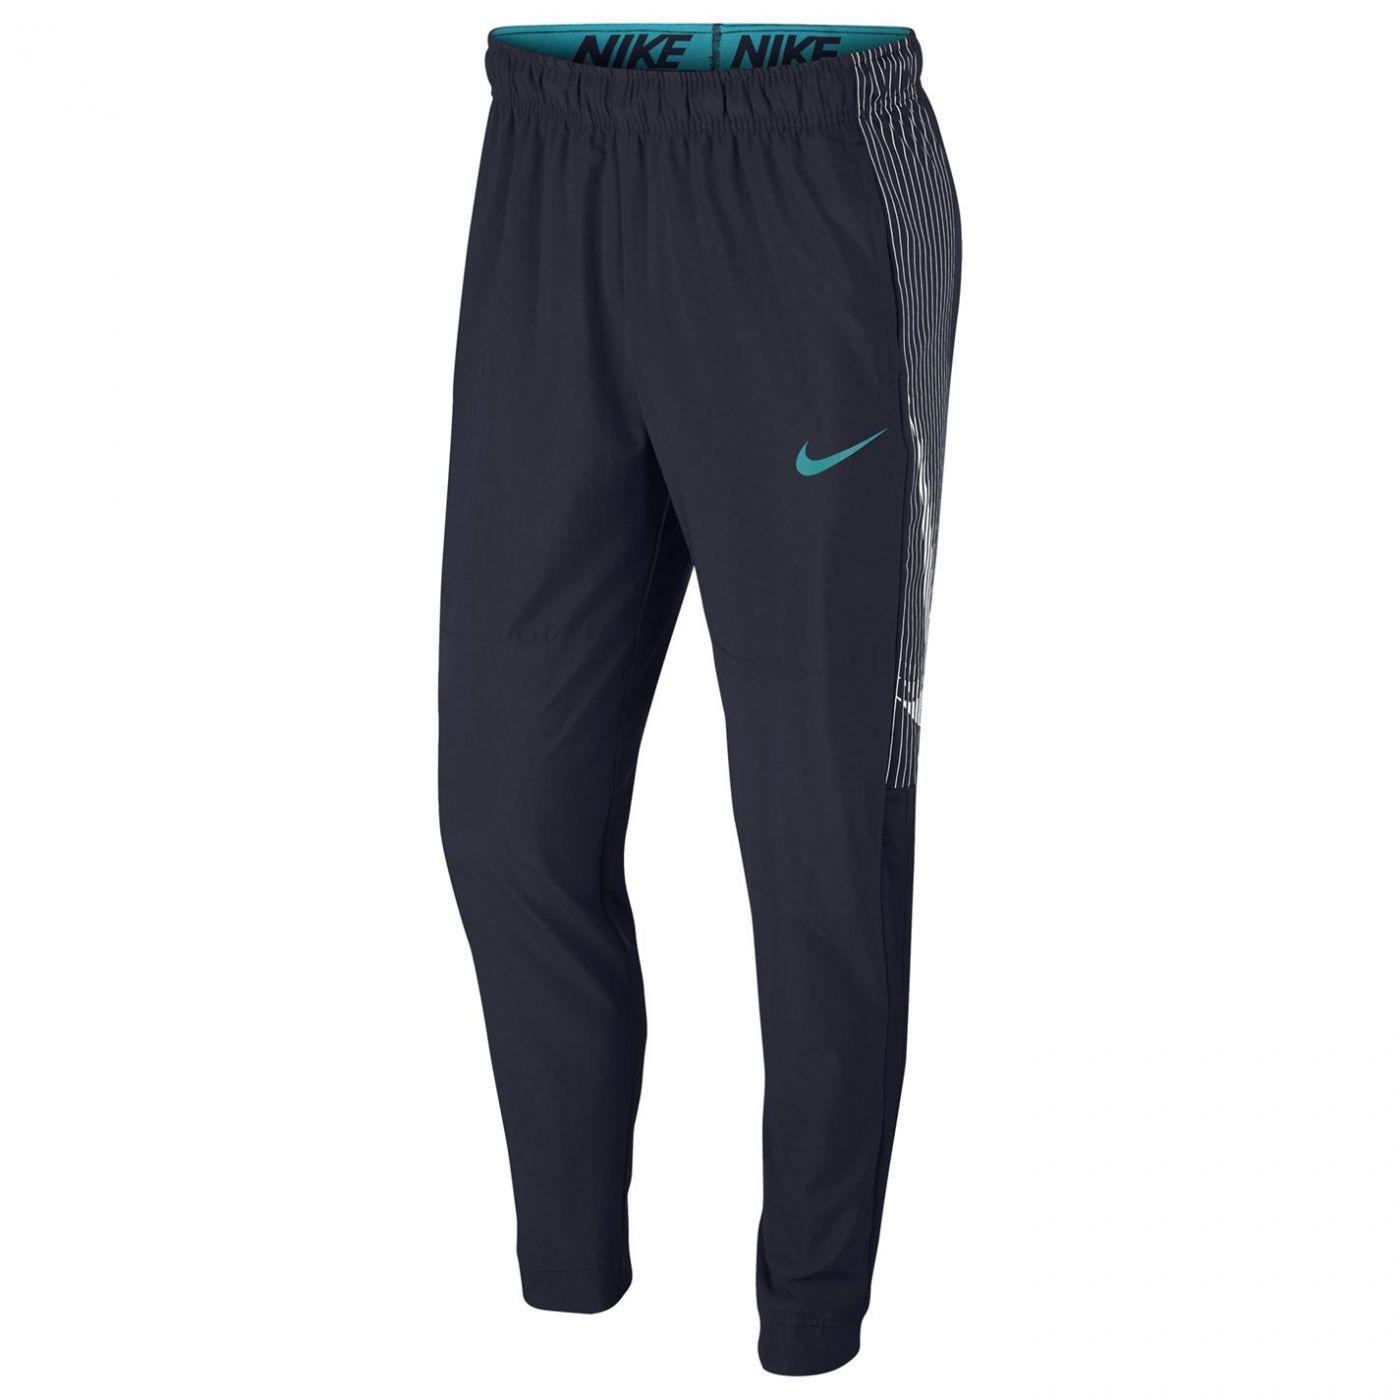 Nike Tapered Dry Jogging Pants Mens